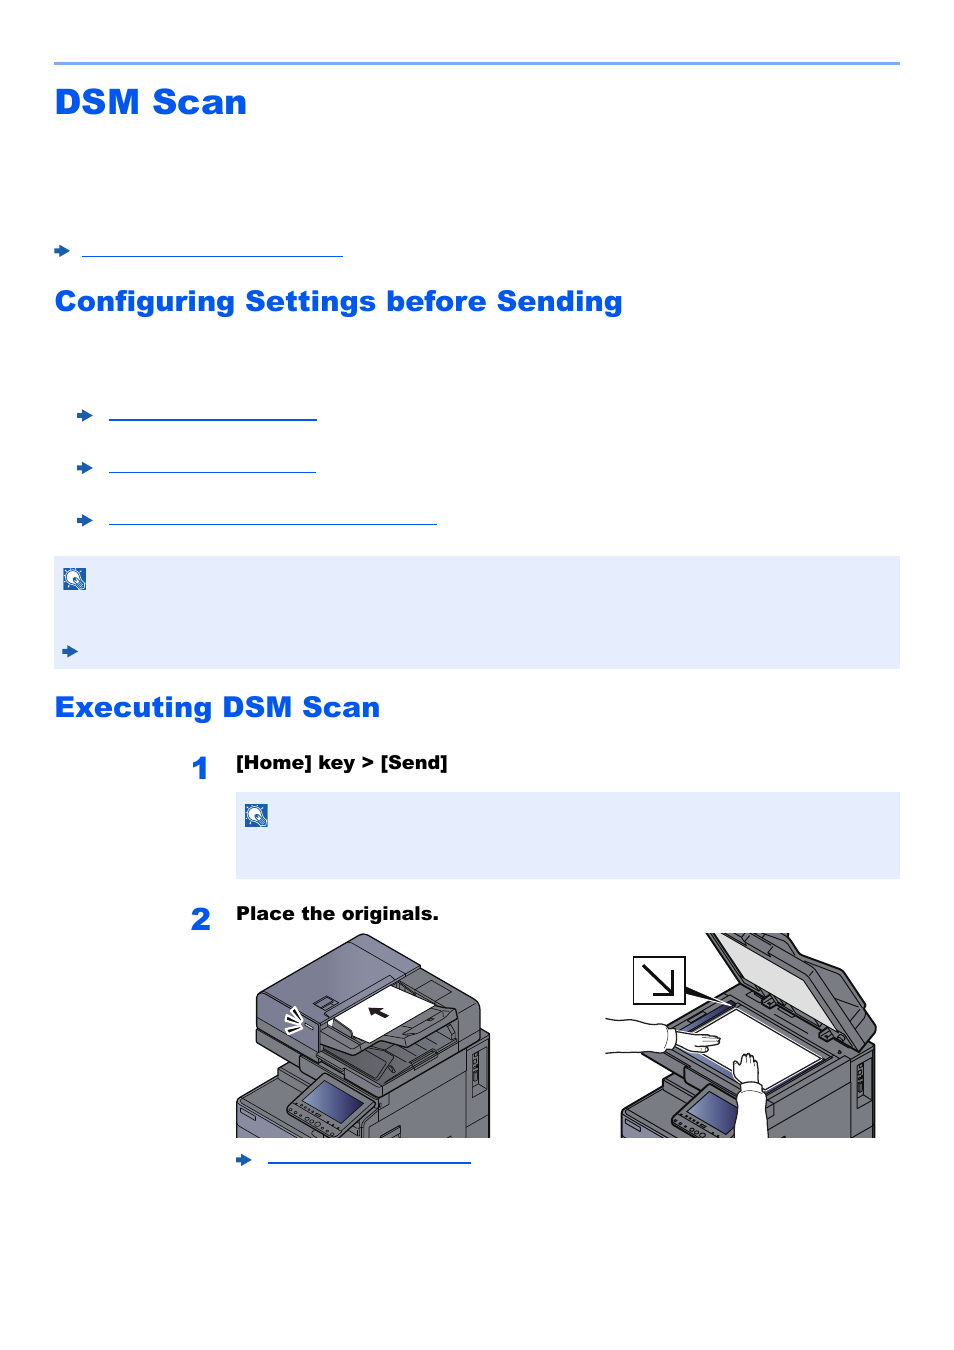 Dsm scan, Configuring settings before sending, Executing dsm